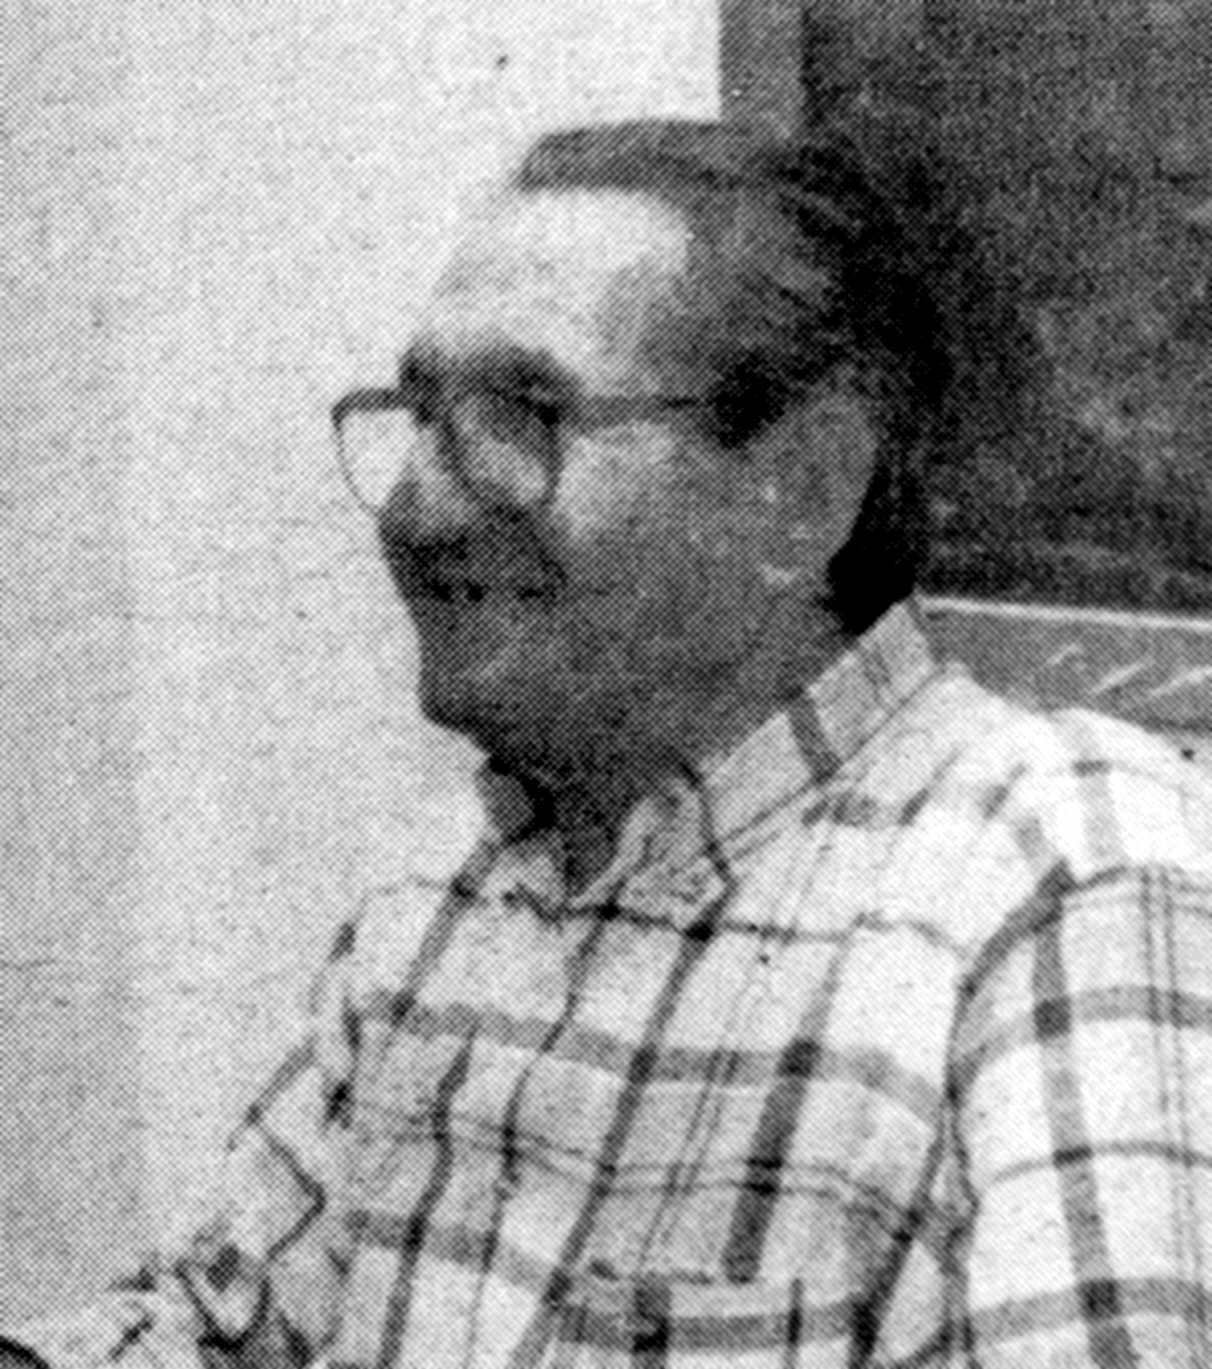 Luis Arrieta de las Heras